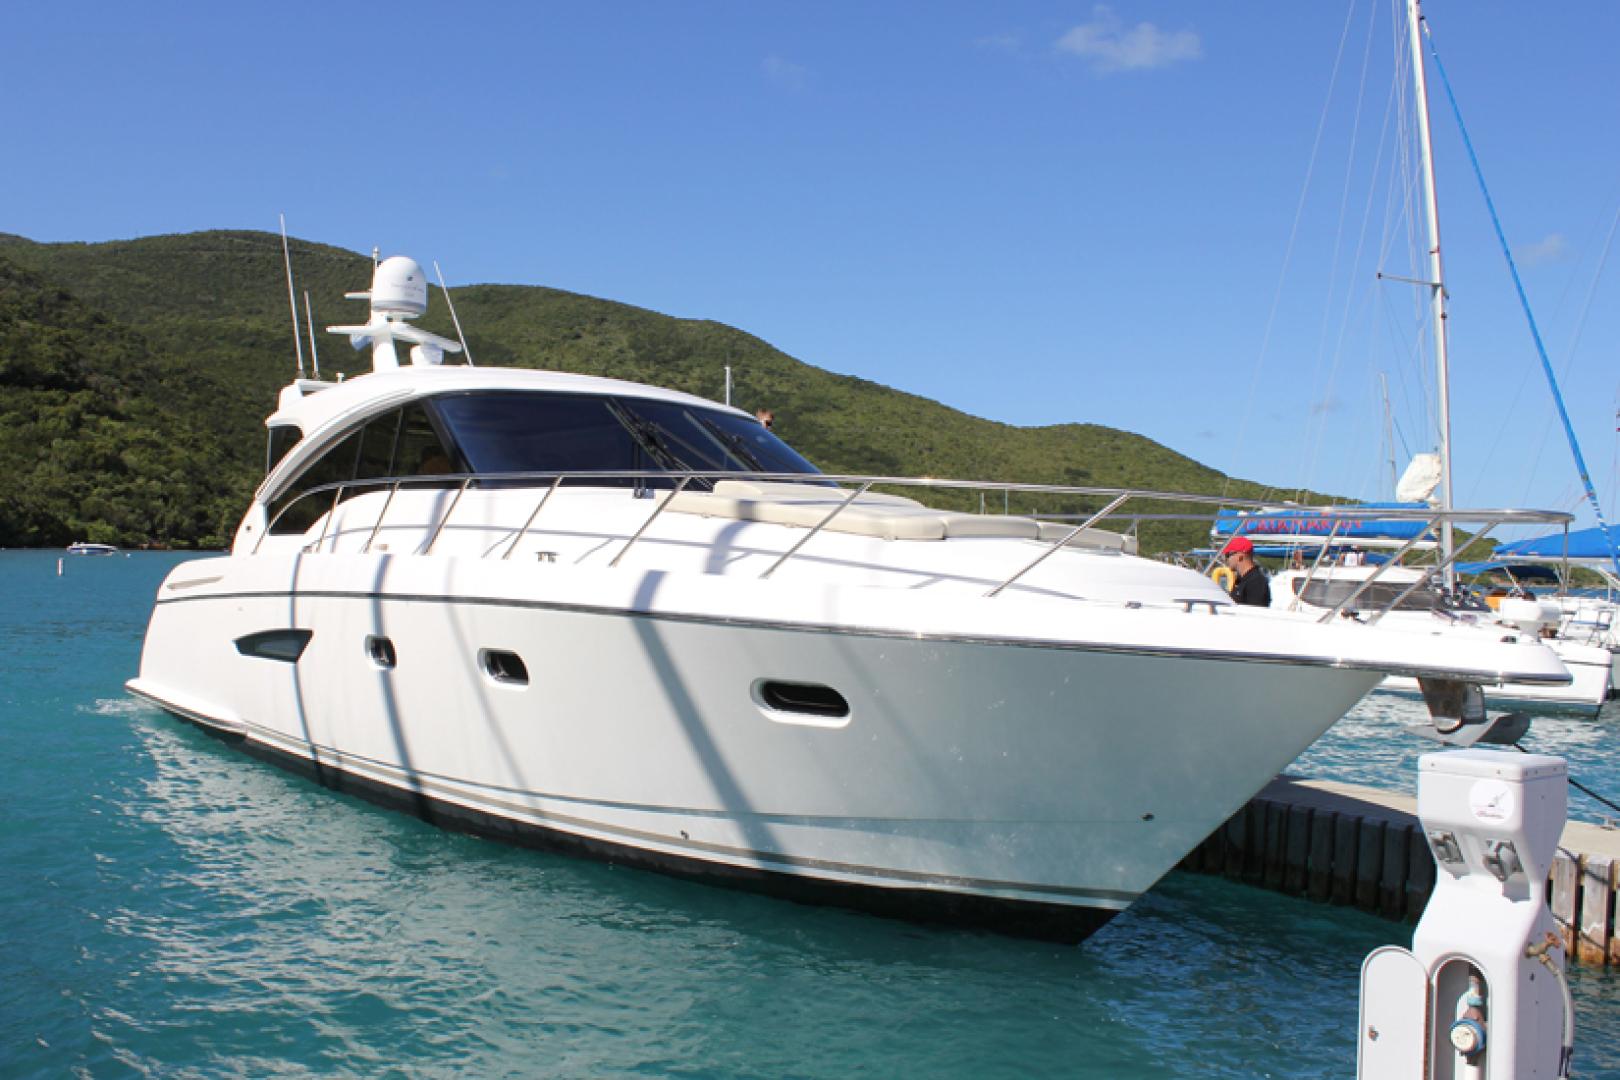 58' Tiara Yachts 2009 5800 Sovran Eventus